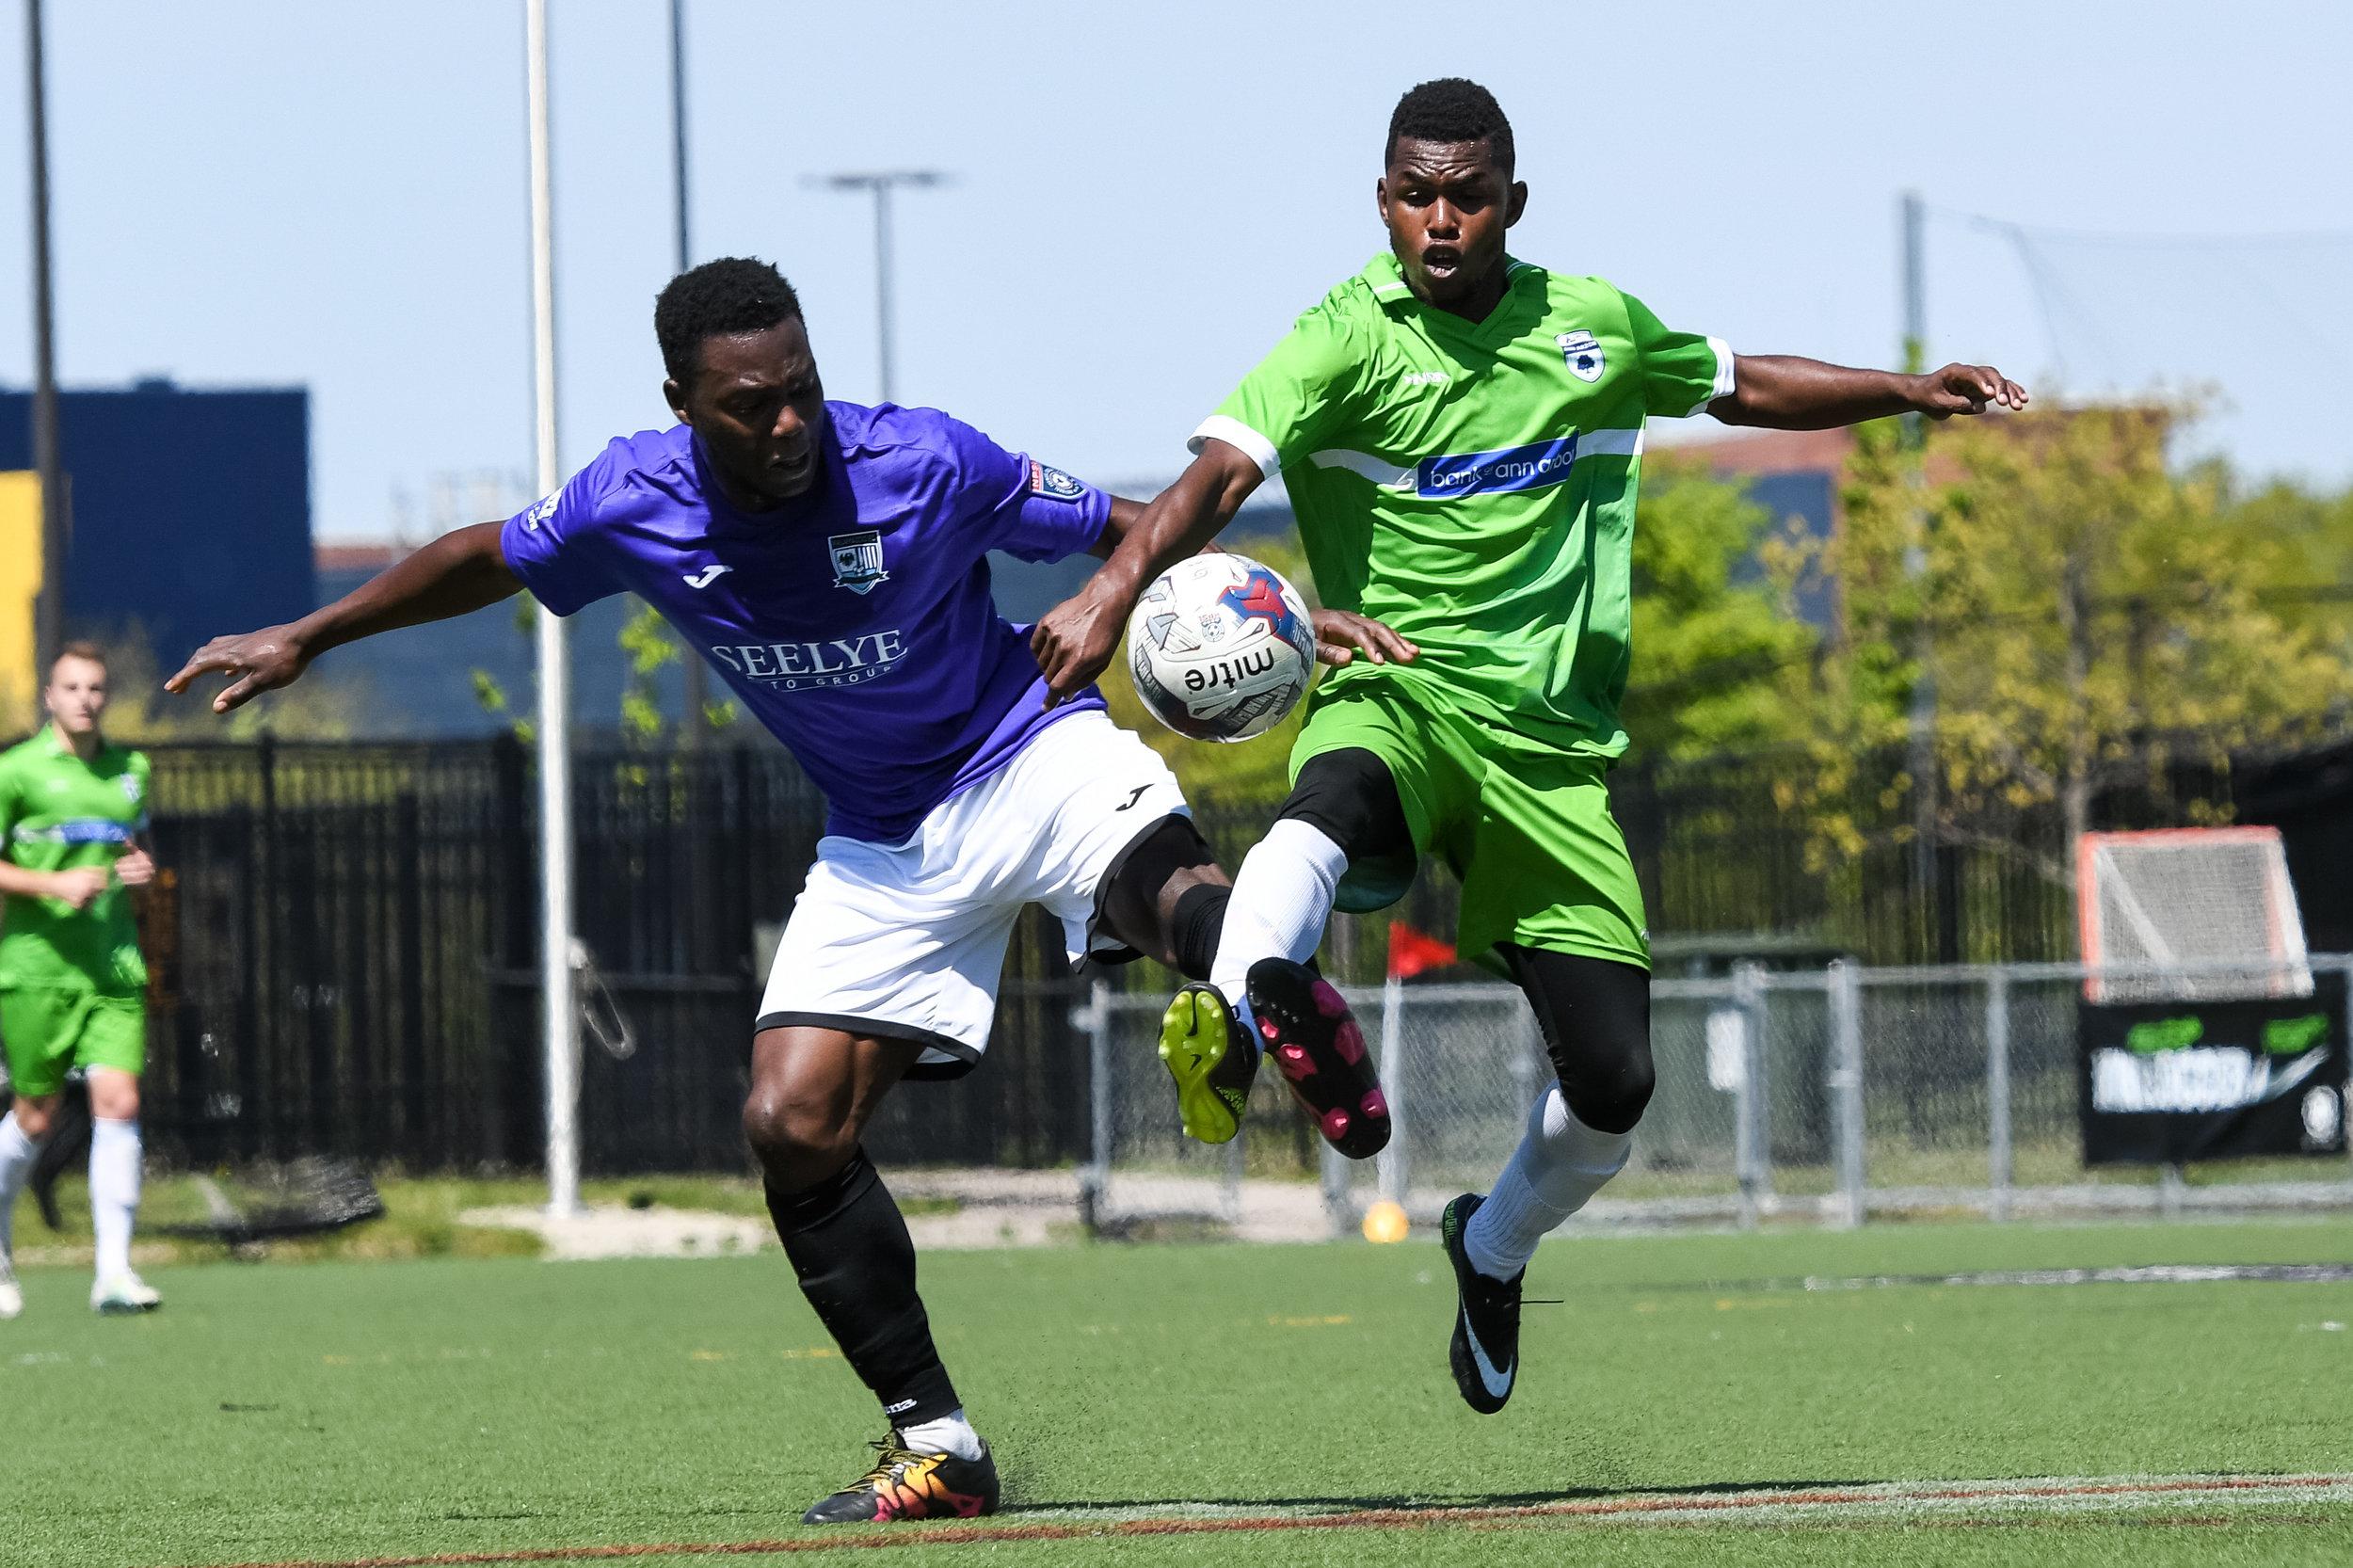 Jesse Muskwe looks to win the ball against Kalamazoo FC's Ade Adeniyi